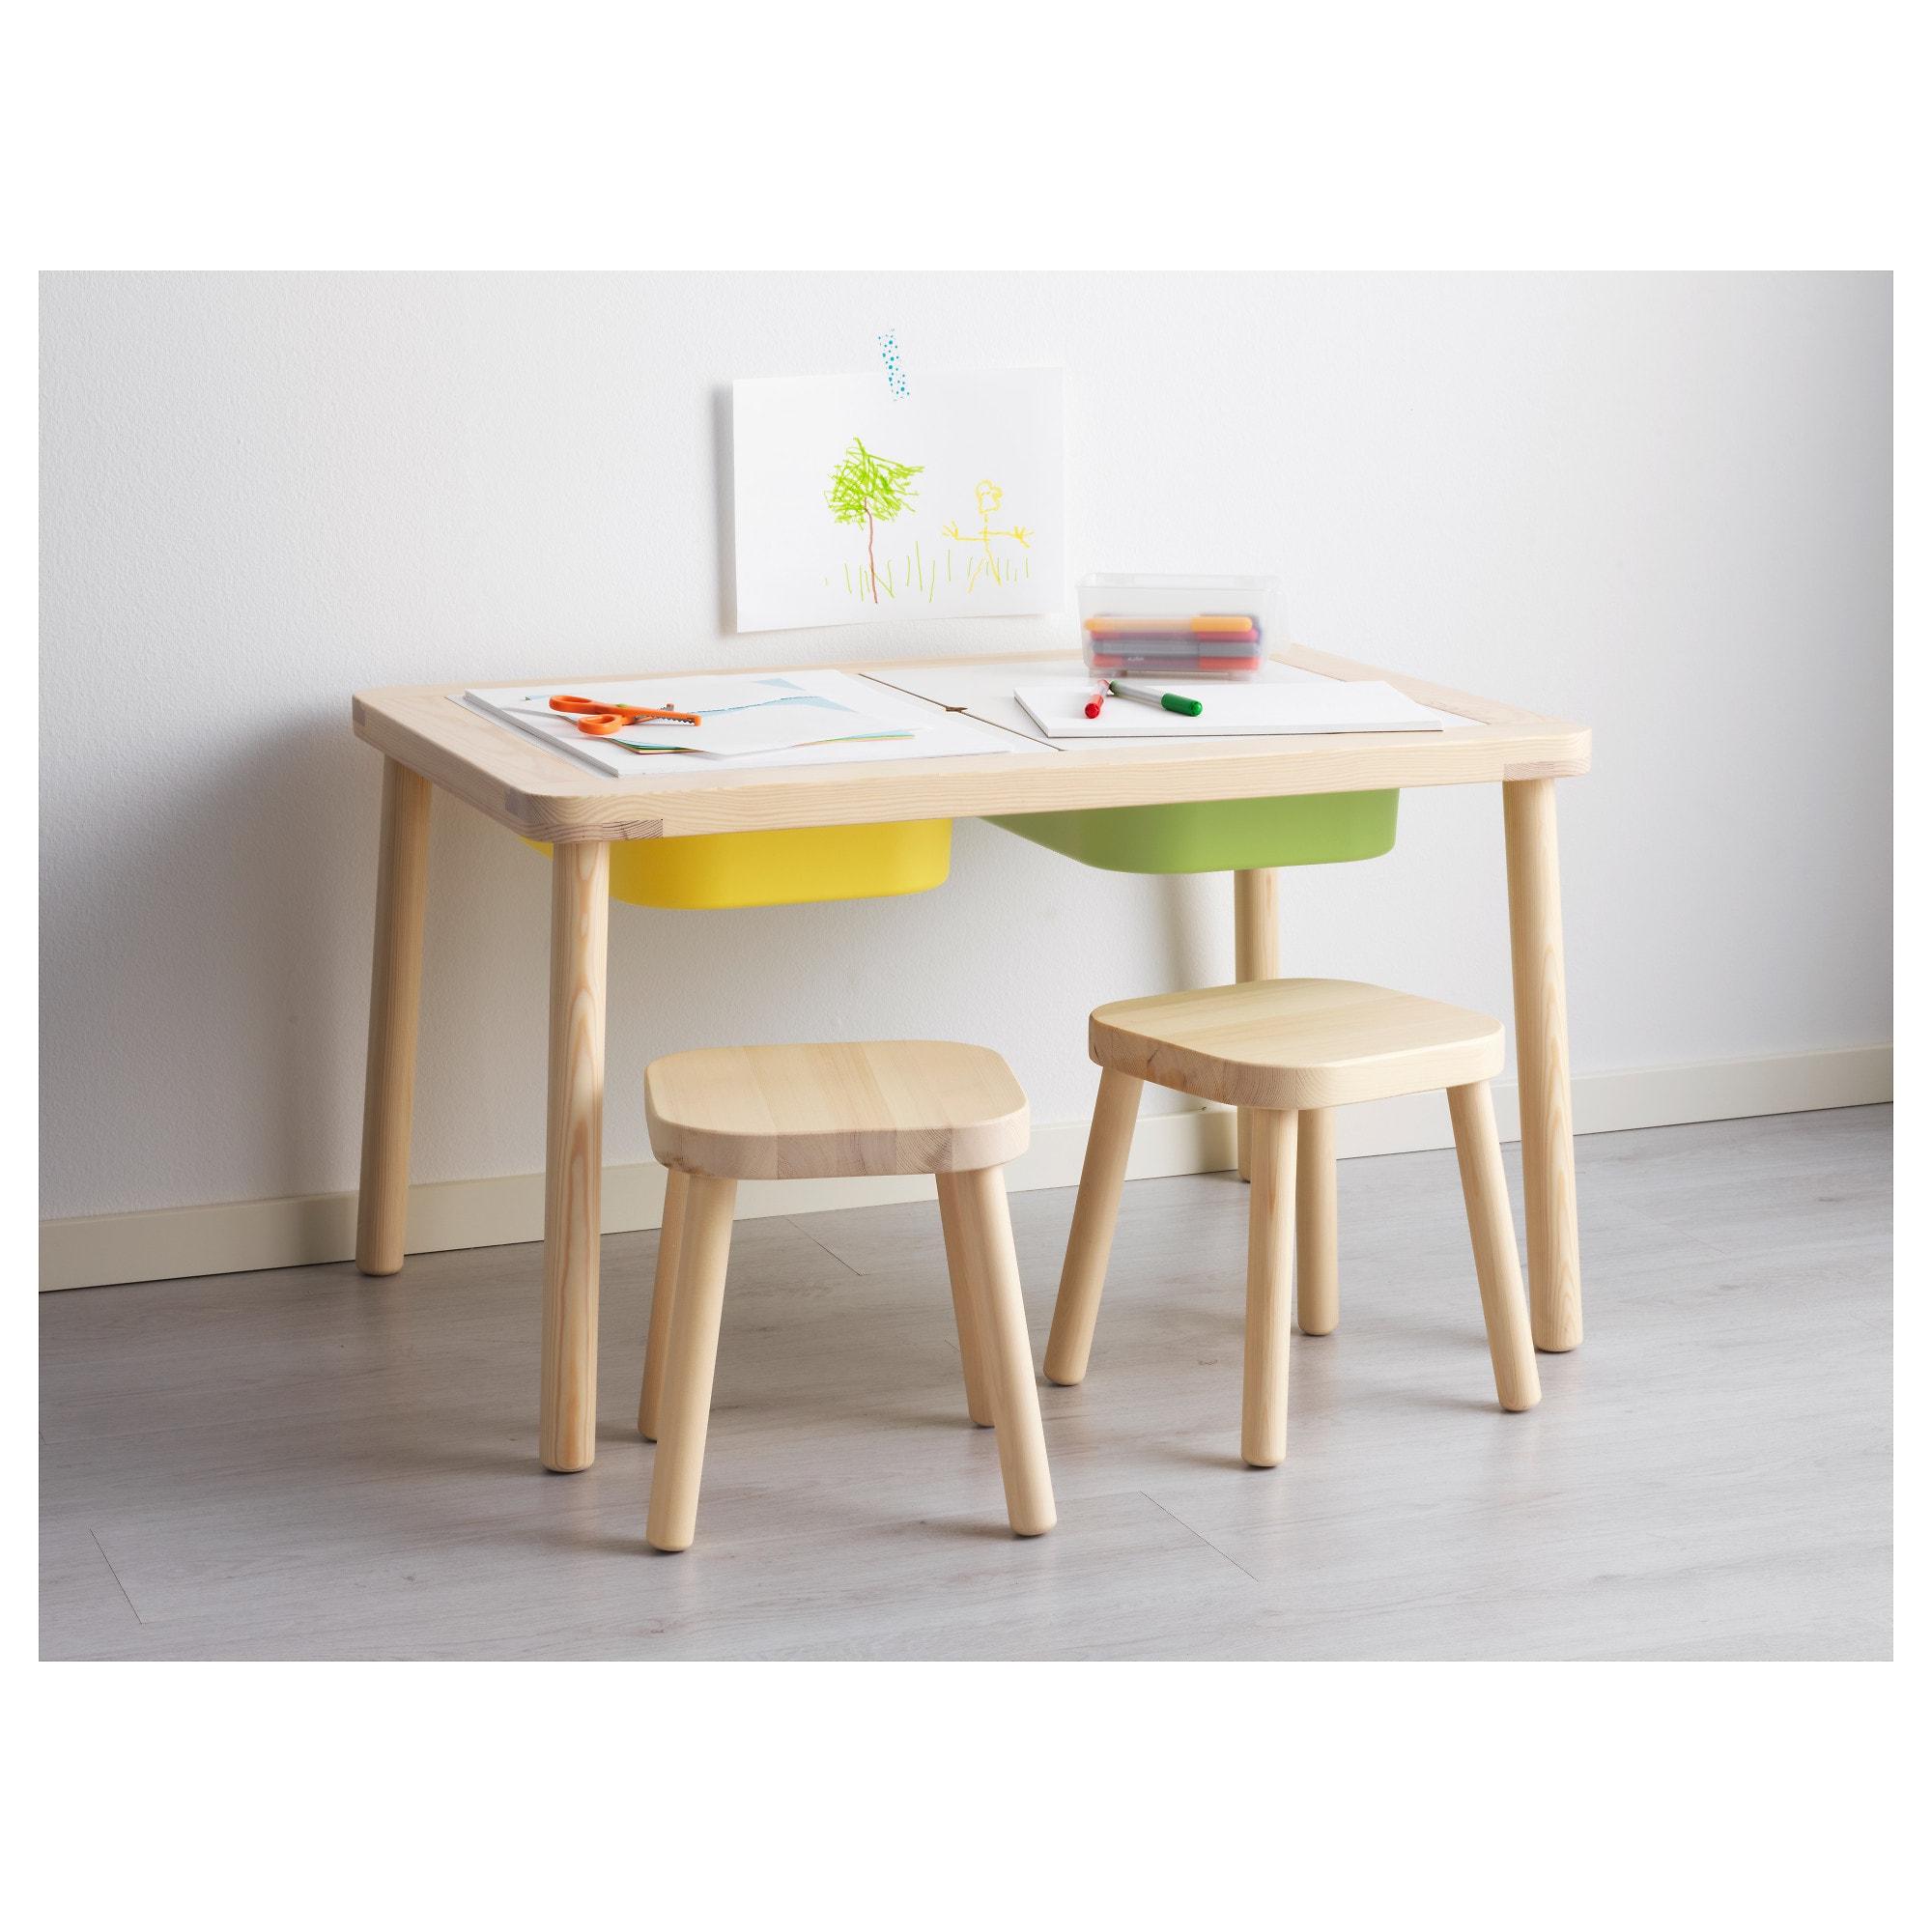 Comprar Mesa De Luz Para Niños Etdg Flisat Mesa Para Nià Os 83 X 58 Cm Ikea